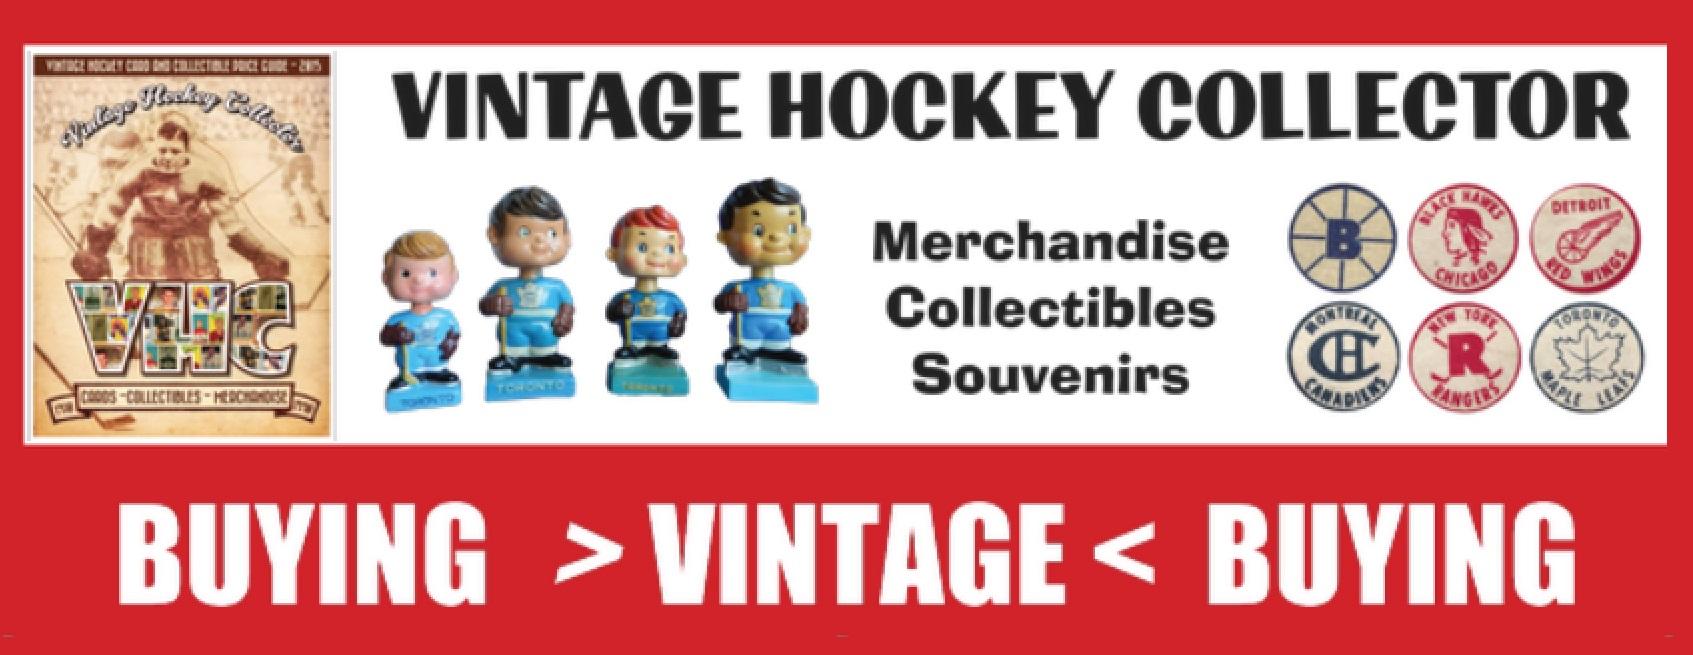 VHC - Vintage Hockey Collector